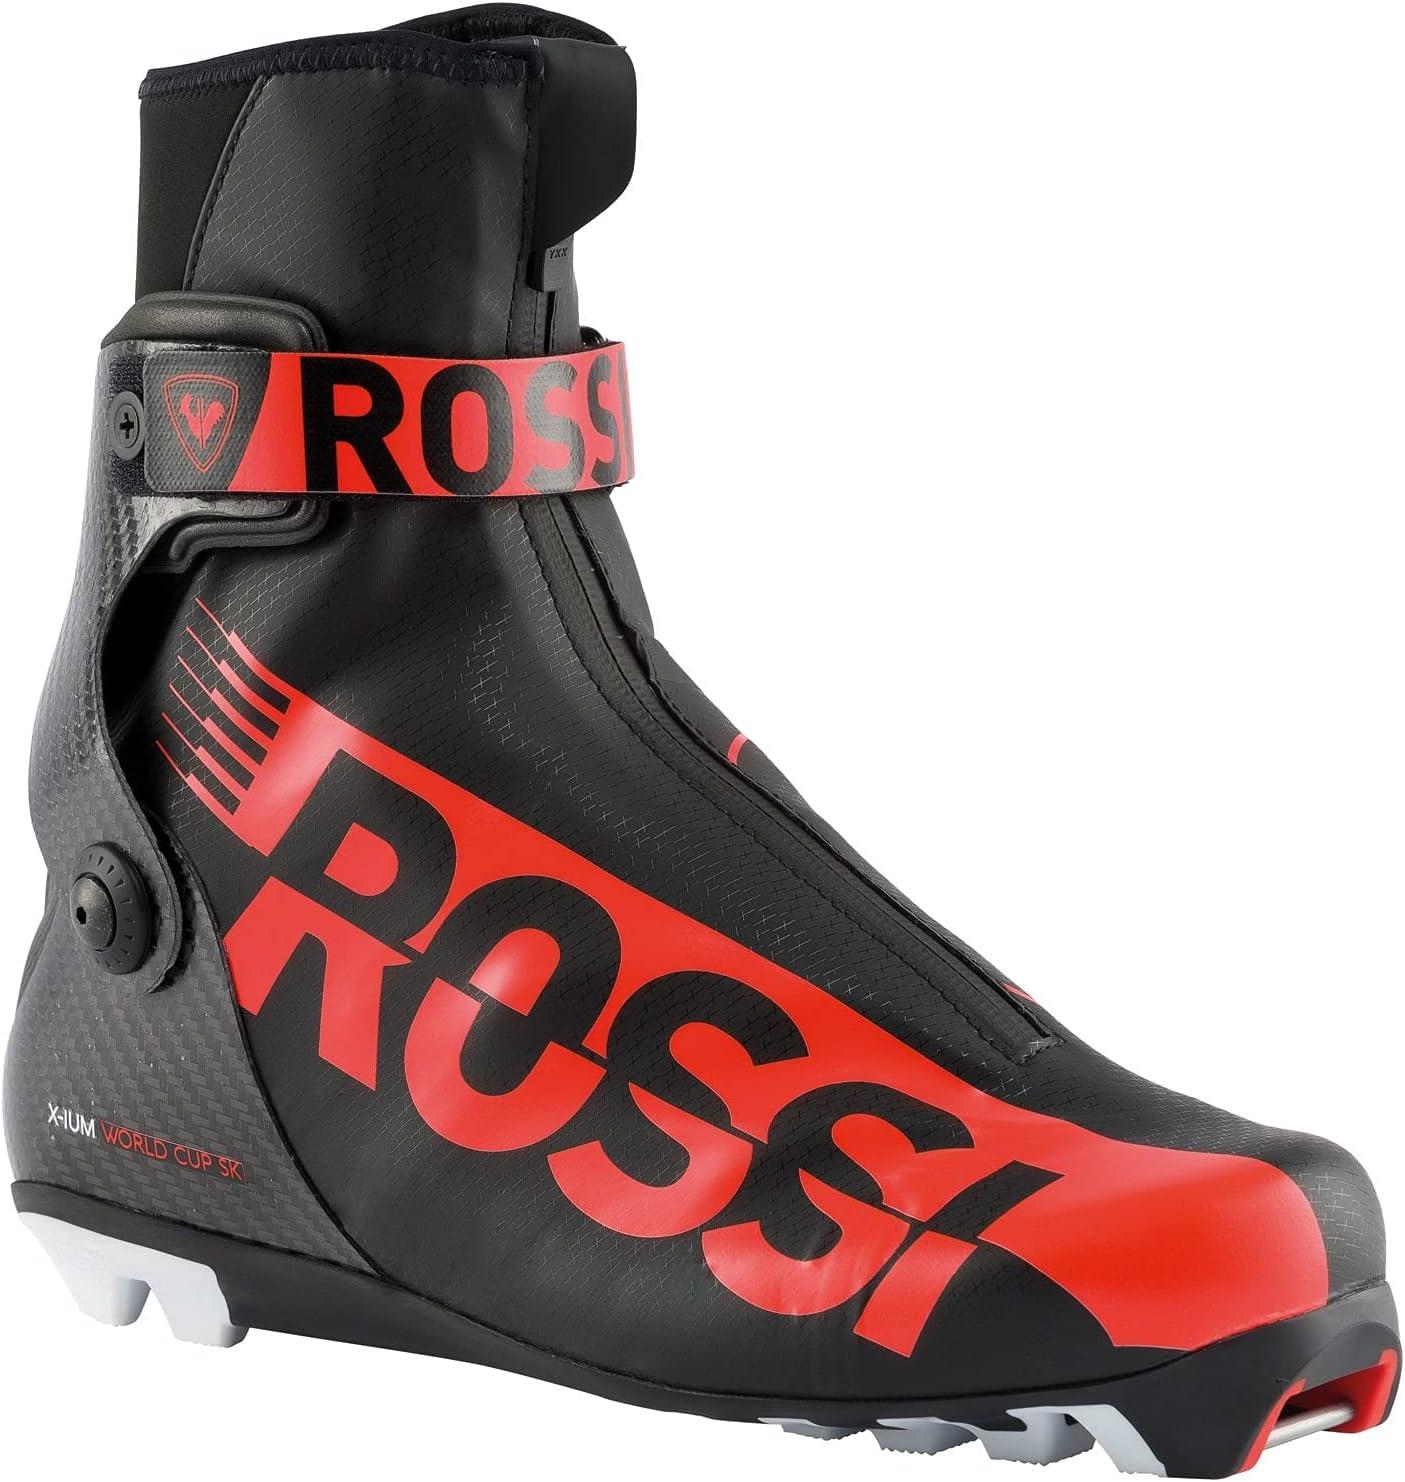 Rossignol X-ium WC cheap discount Skate Boots Ski XC Mens